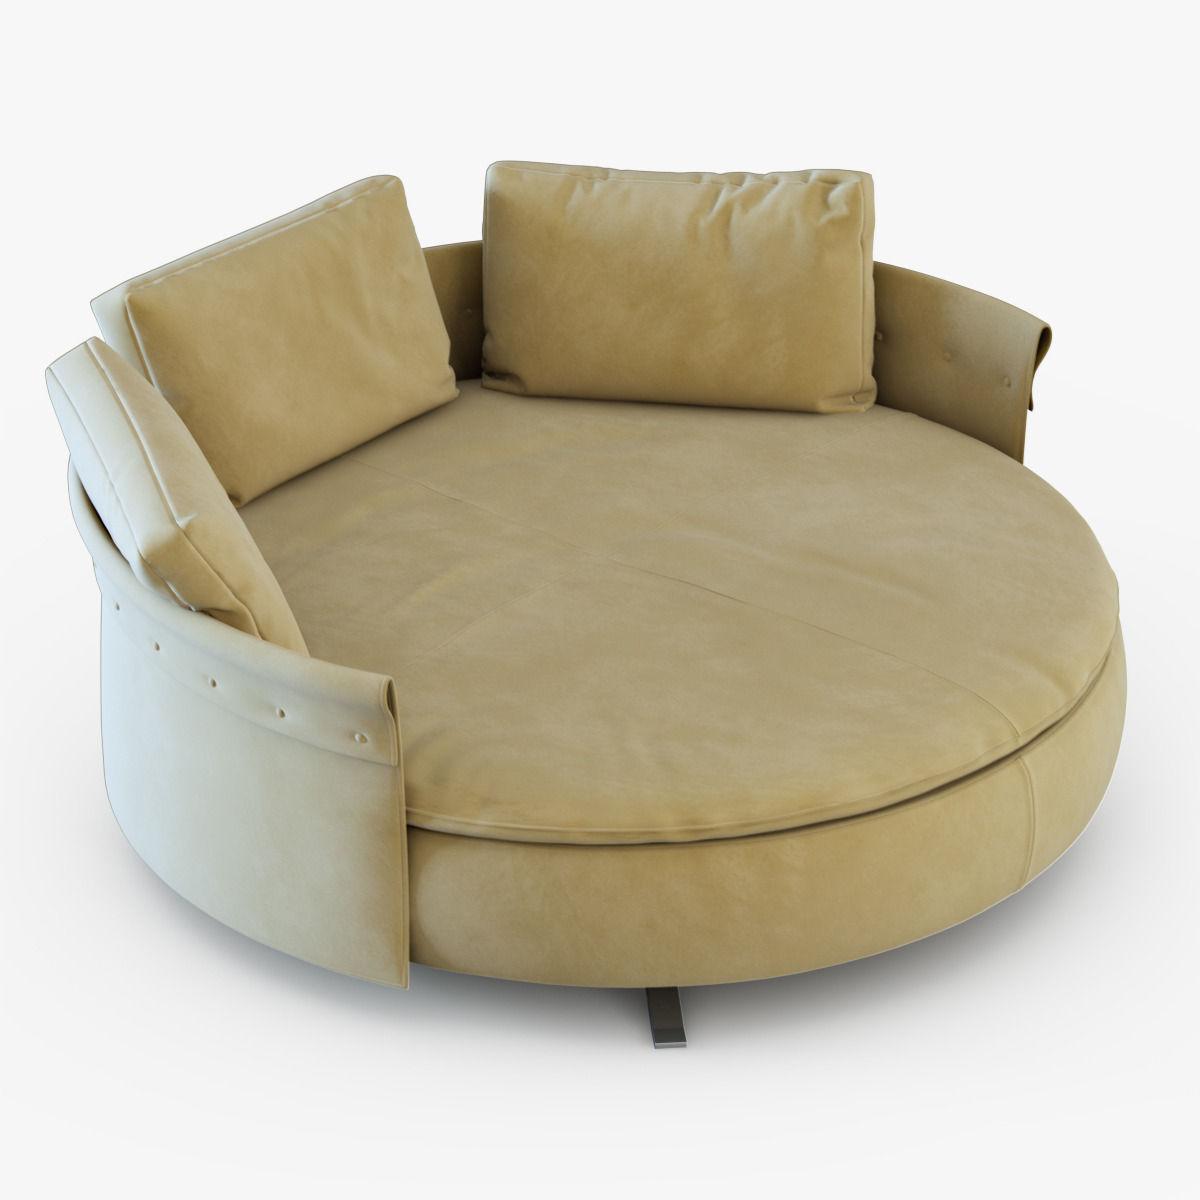 Max Sofas Donostia Innen und M246bel Inspiration : sofa charme longhi 3d model max from ovenpro.net size 1200 x 1200 jpeg 78kB